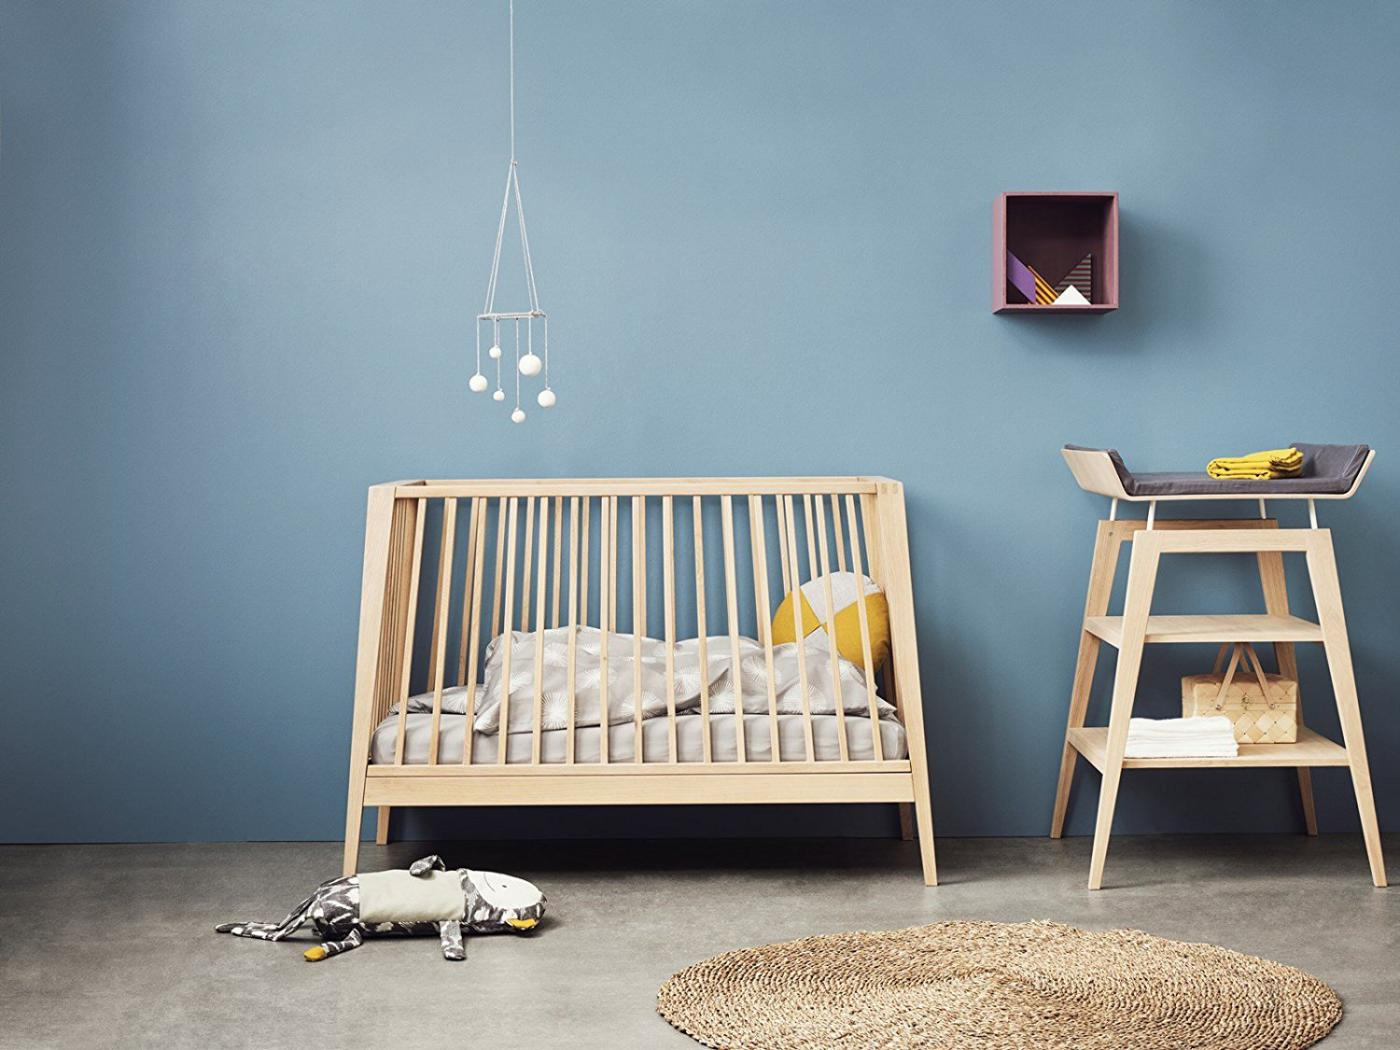 leander housse de matelas langer gris anthracite pour. Black Bedroom Furniture Sets. Home Design Ideas